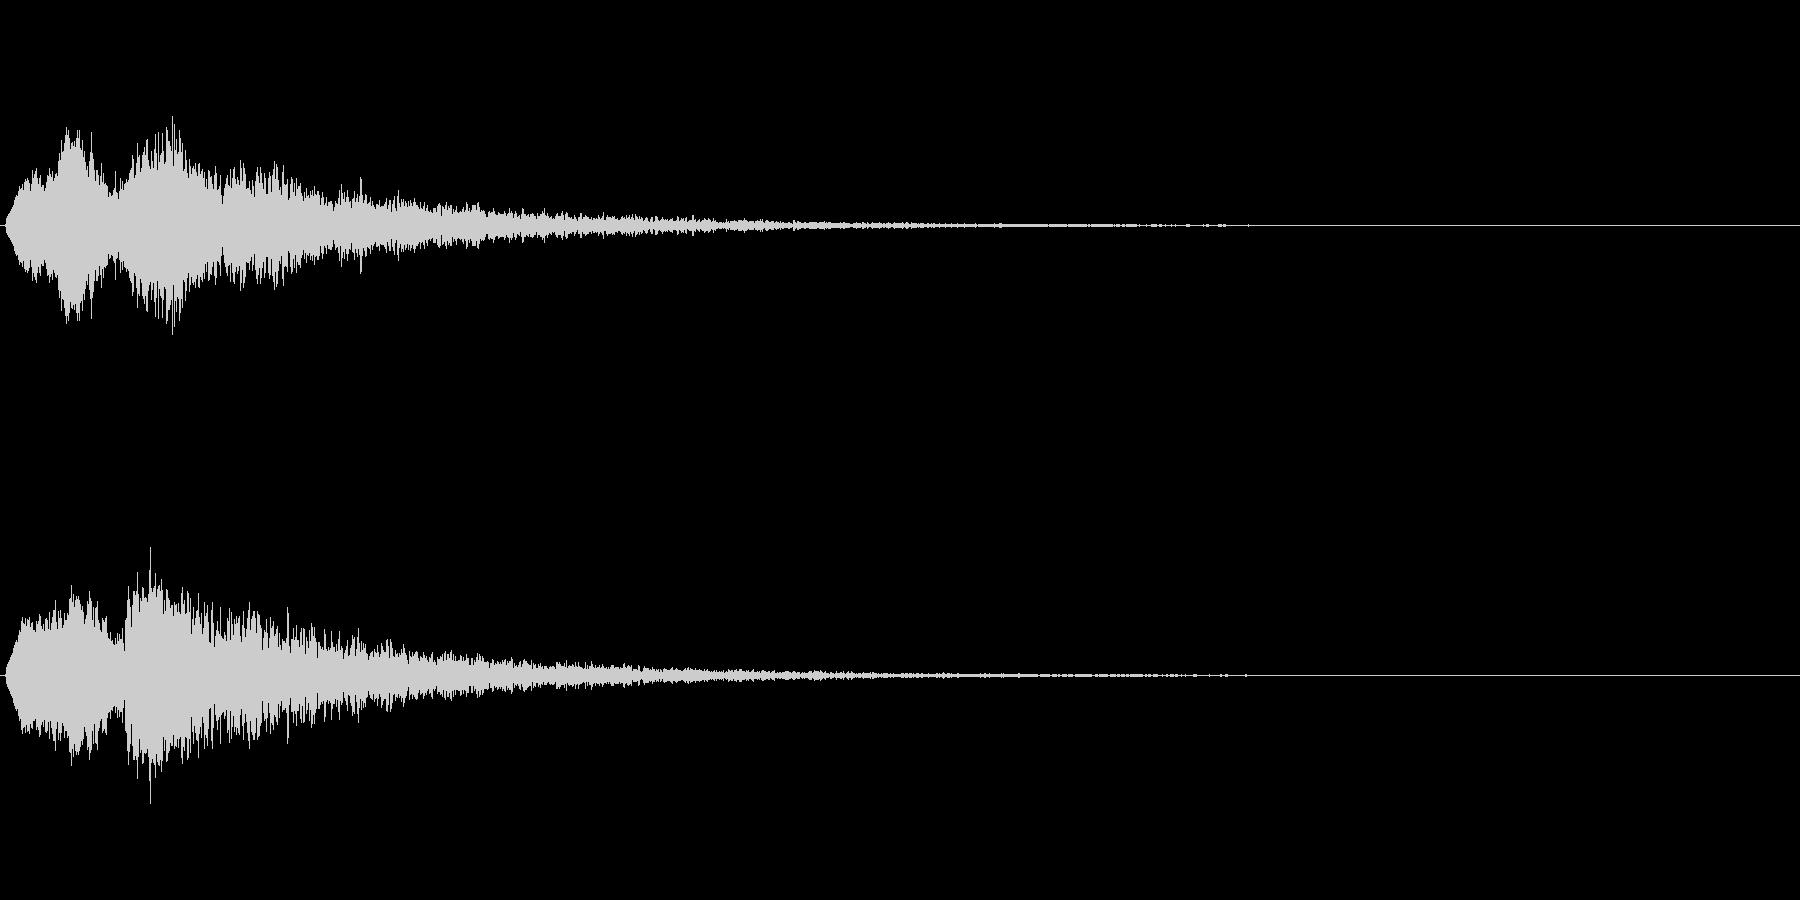 Vox 不気味な鳴き声 ホラーSE 7の未再生の波形